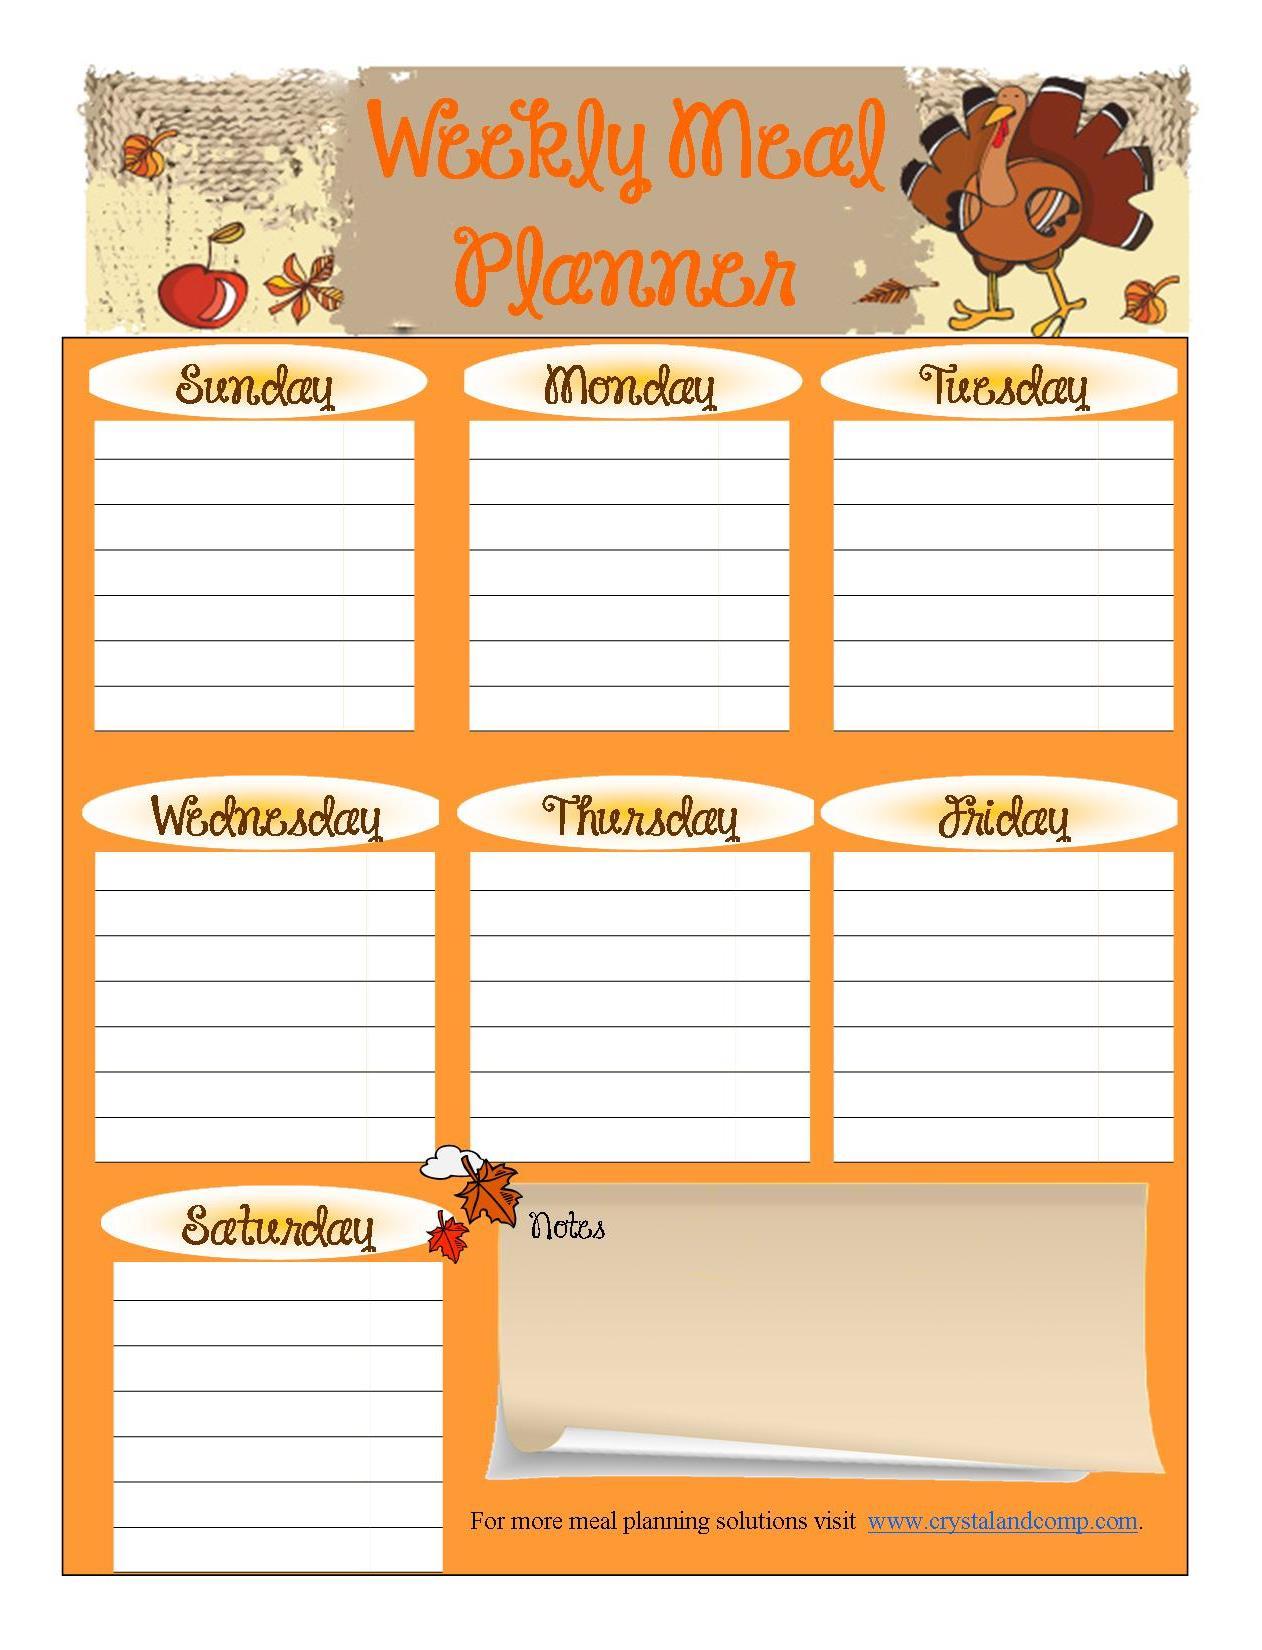 7 Images of Menu Planning Free Printable Worksheets